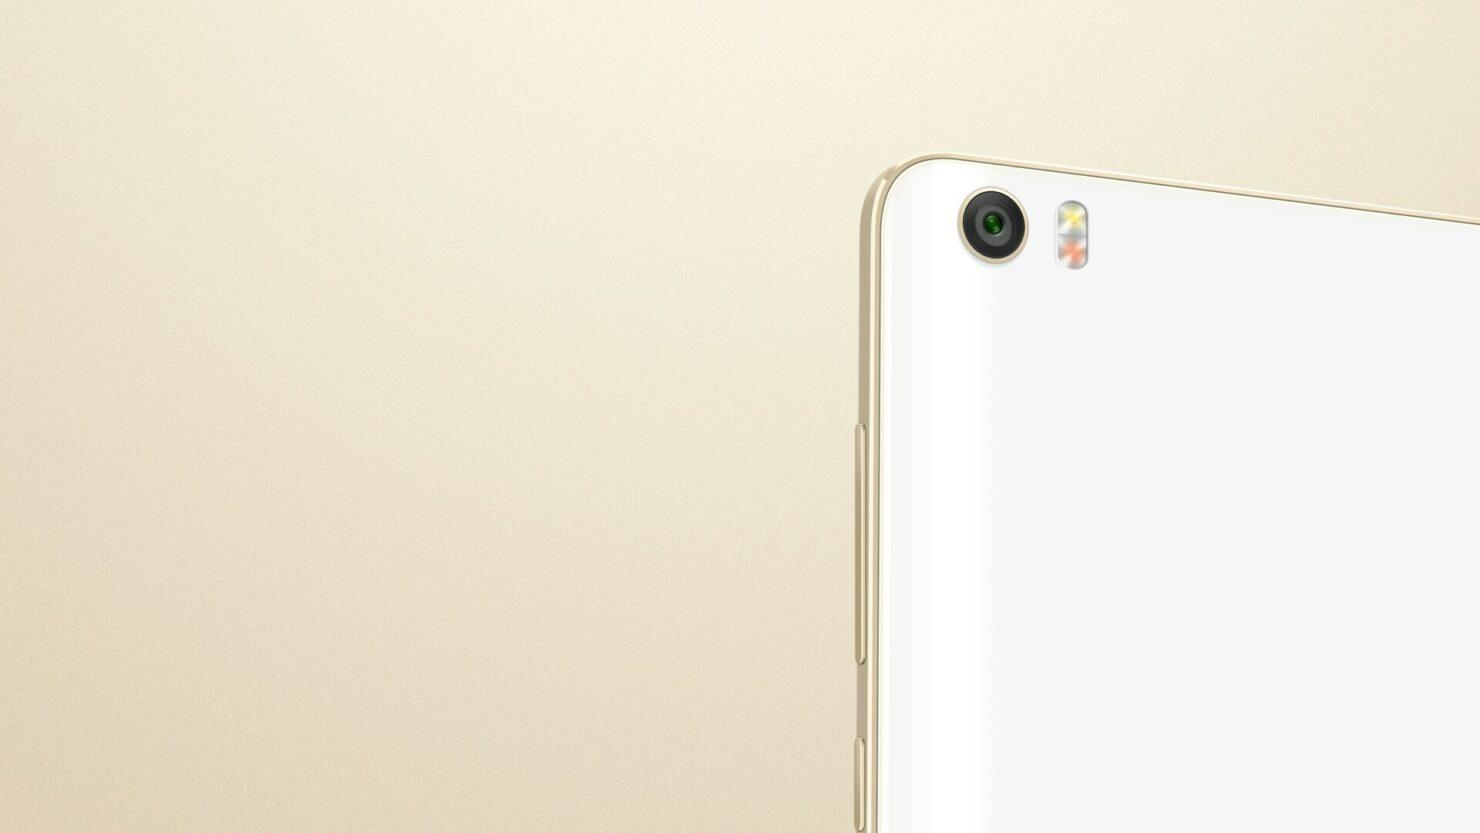 Xiaomi Mi5s camera sample shared